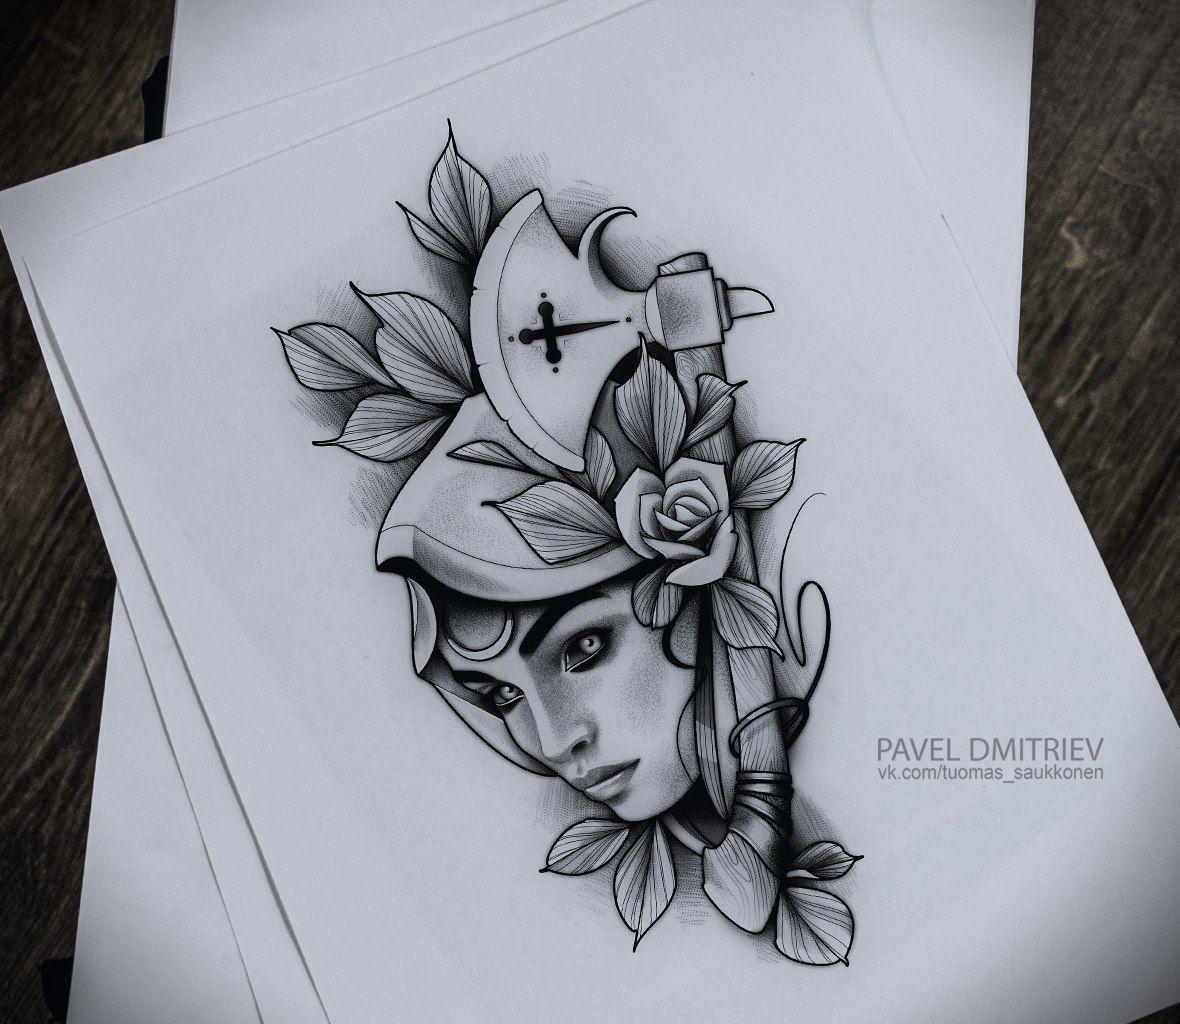 Blackwork Tattoo Dotwork Linework Blacktattoo Neotraditional Portrait Drawing Sketch Dark Inspiracao Para Tatuagem Adagas Tattoo Tatuagem Grega